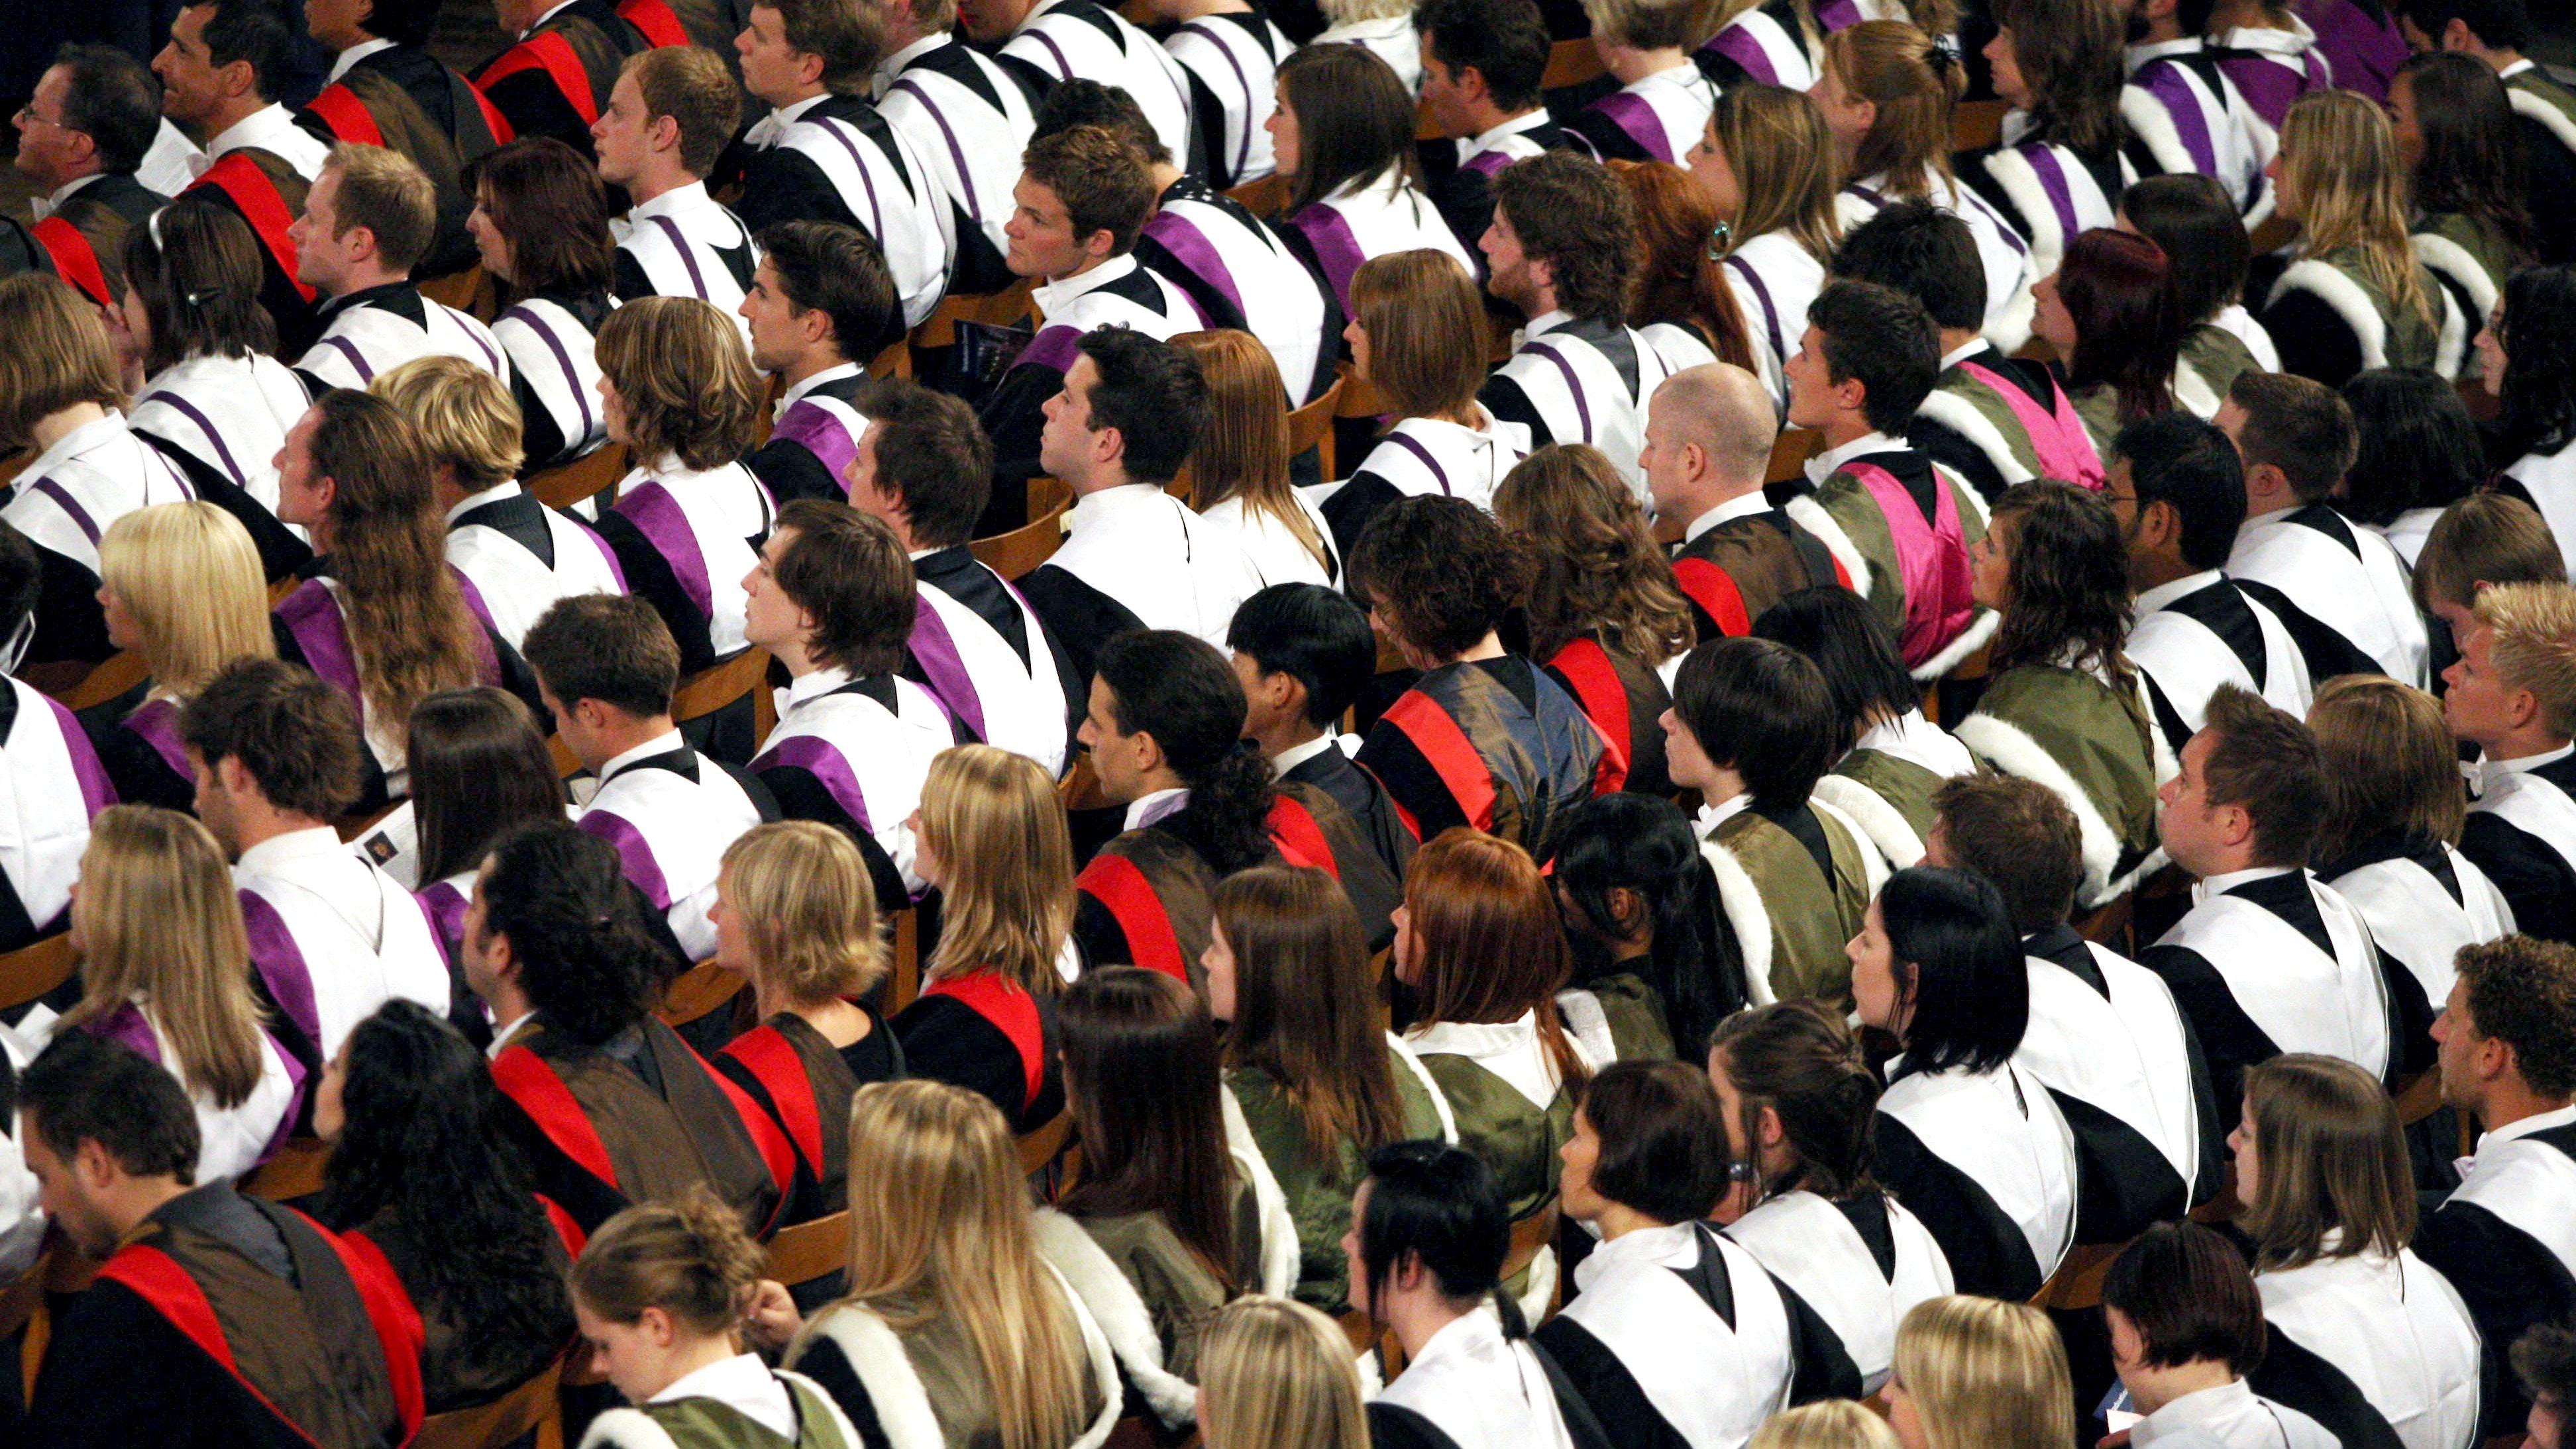 Free speech at universities 'being shut down'